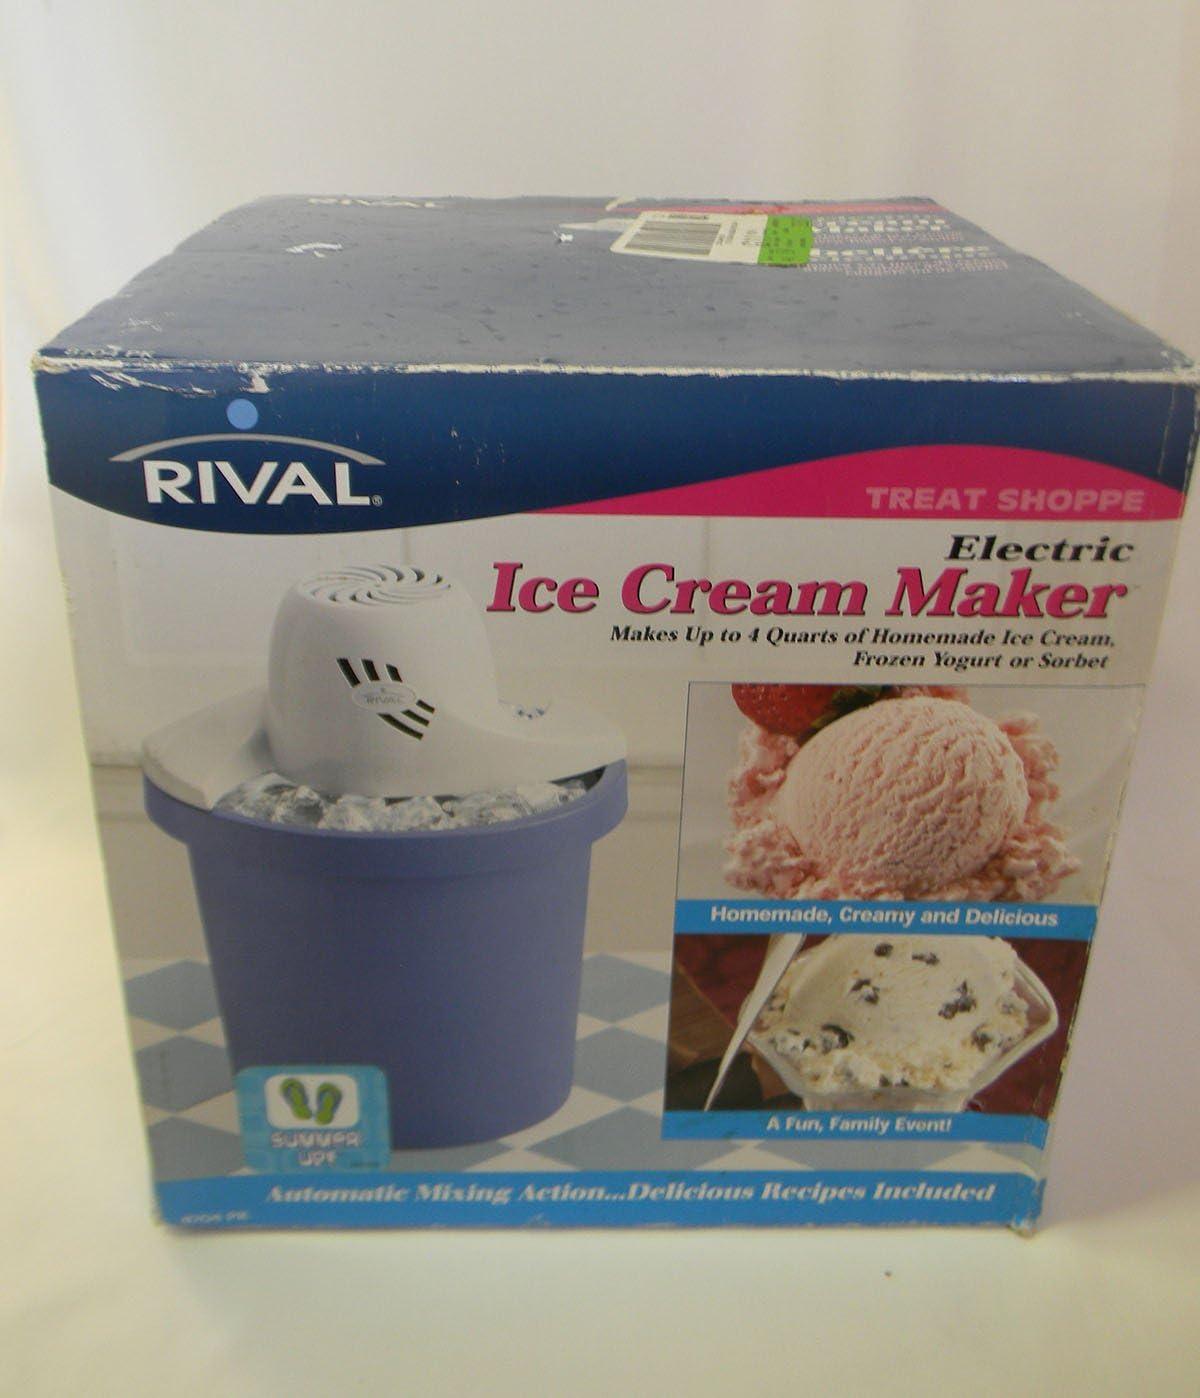 Machine makes Homemade Ice Cream Rival 8704P 4 Qt Yogurt or Sorbet